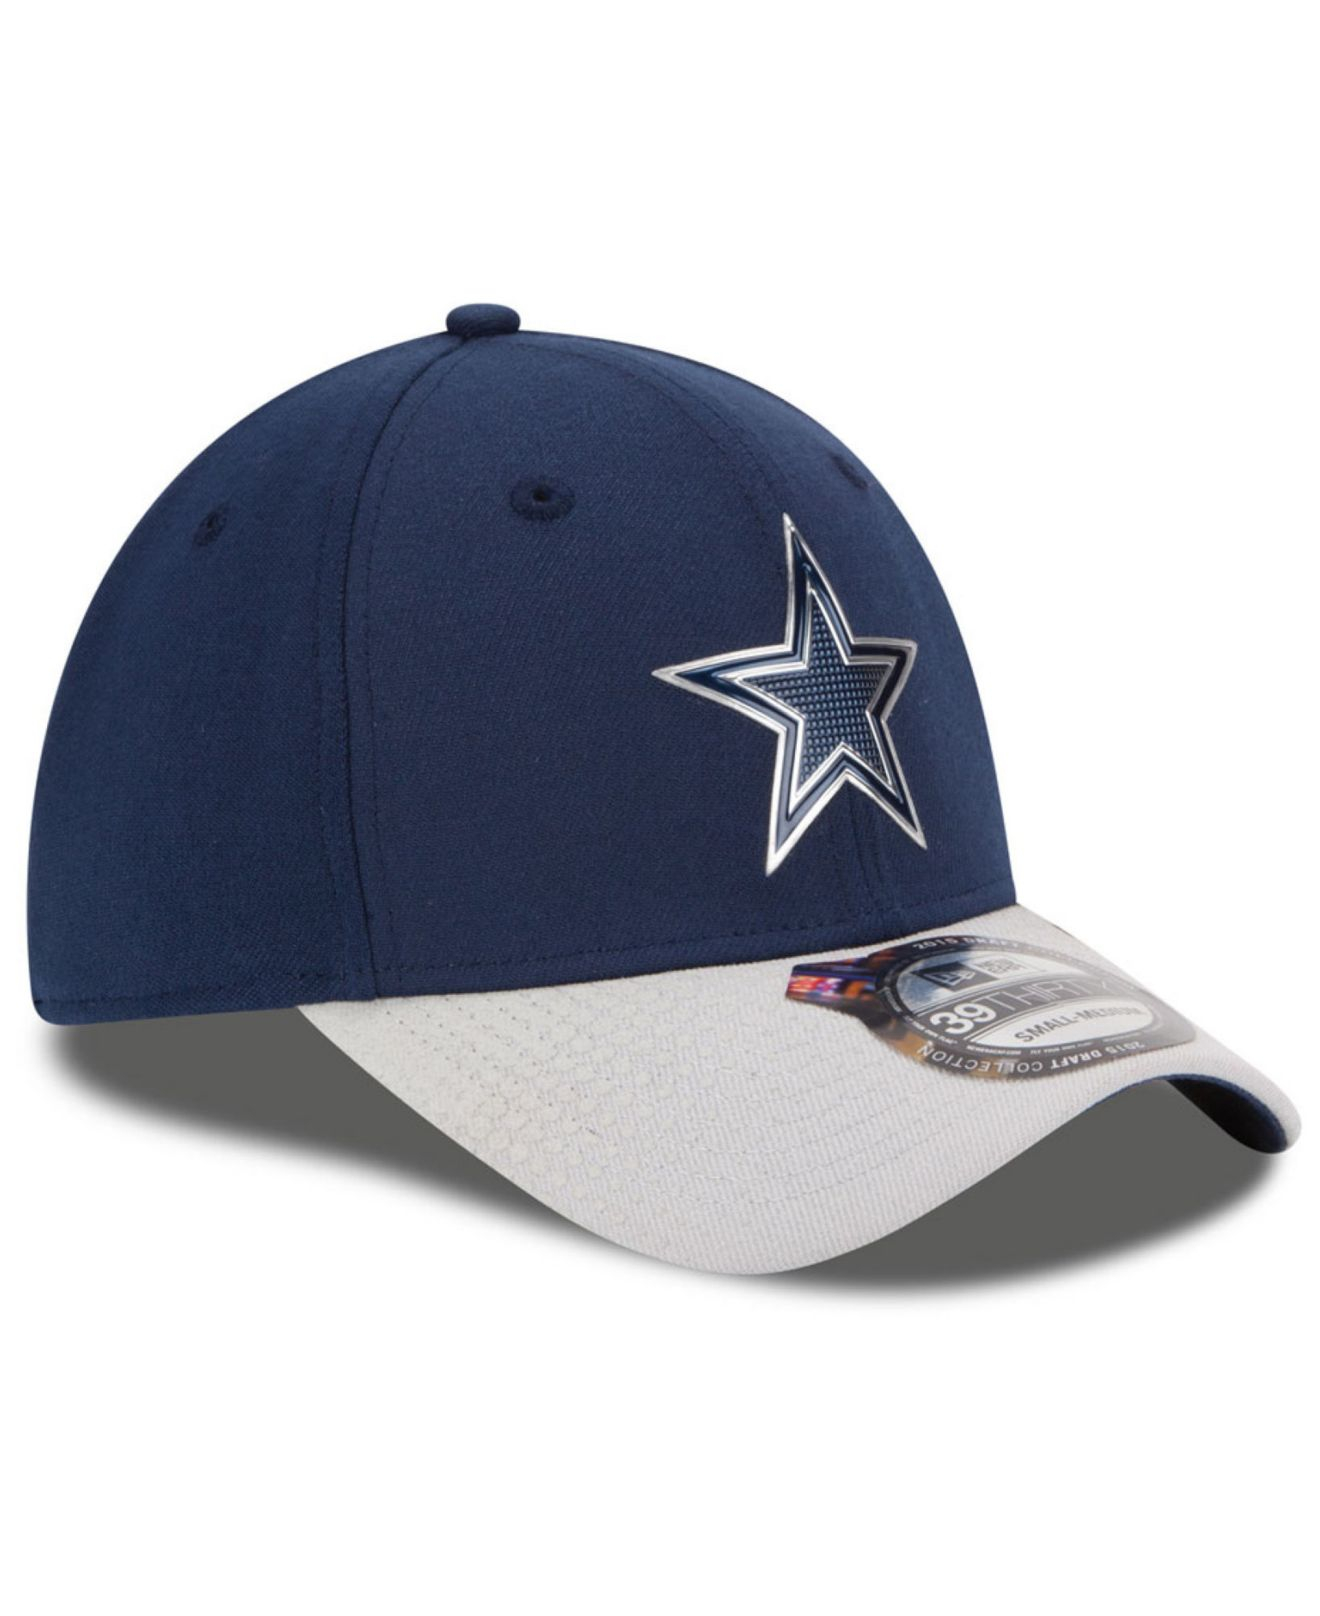 Lyst - KTZ Dallas Cowboys 2015 Nfl Draft 39Thirty Cap in Blue for Men f0f6b7d18ab